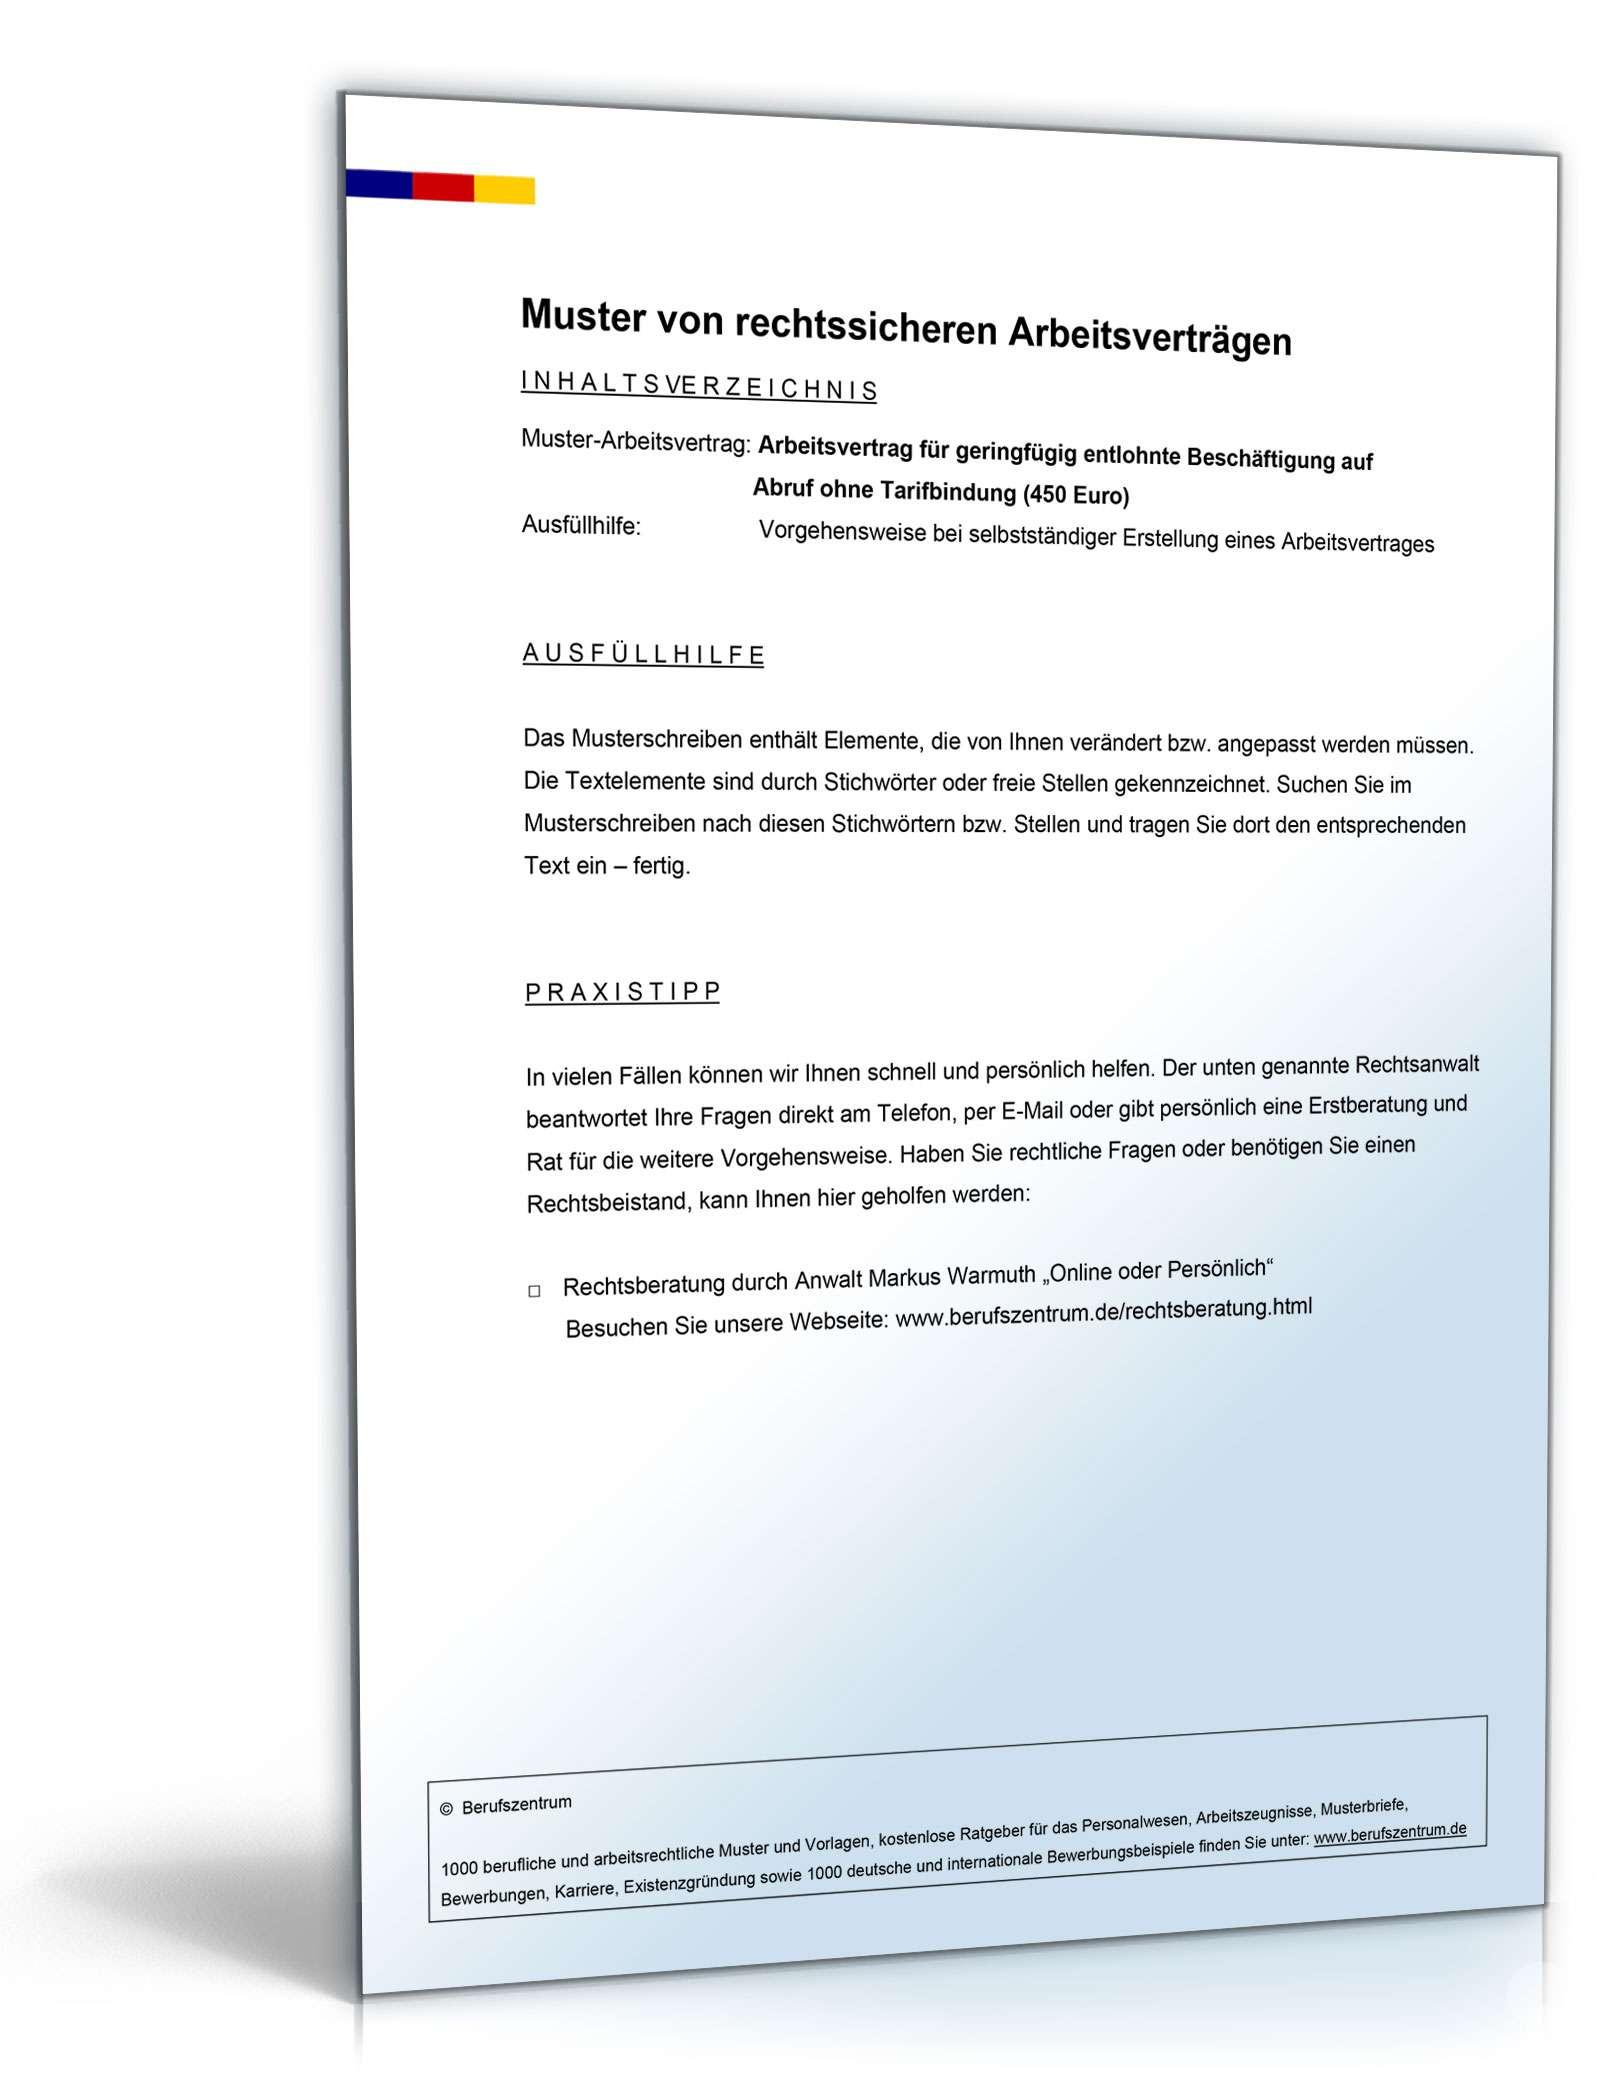 pdf seite 2 - Muster Arbeitsvertrag Geringfugige Beschaftigung